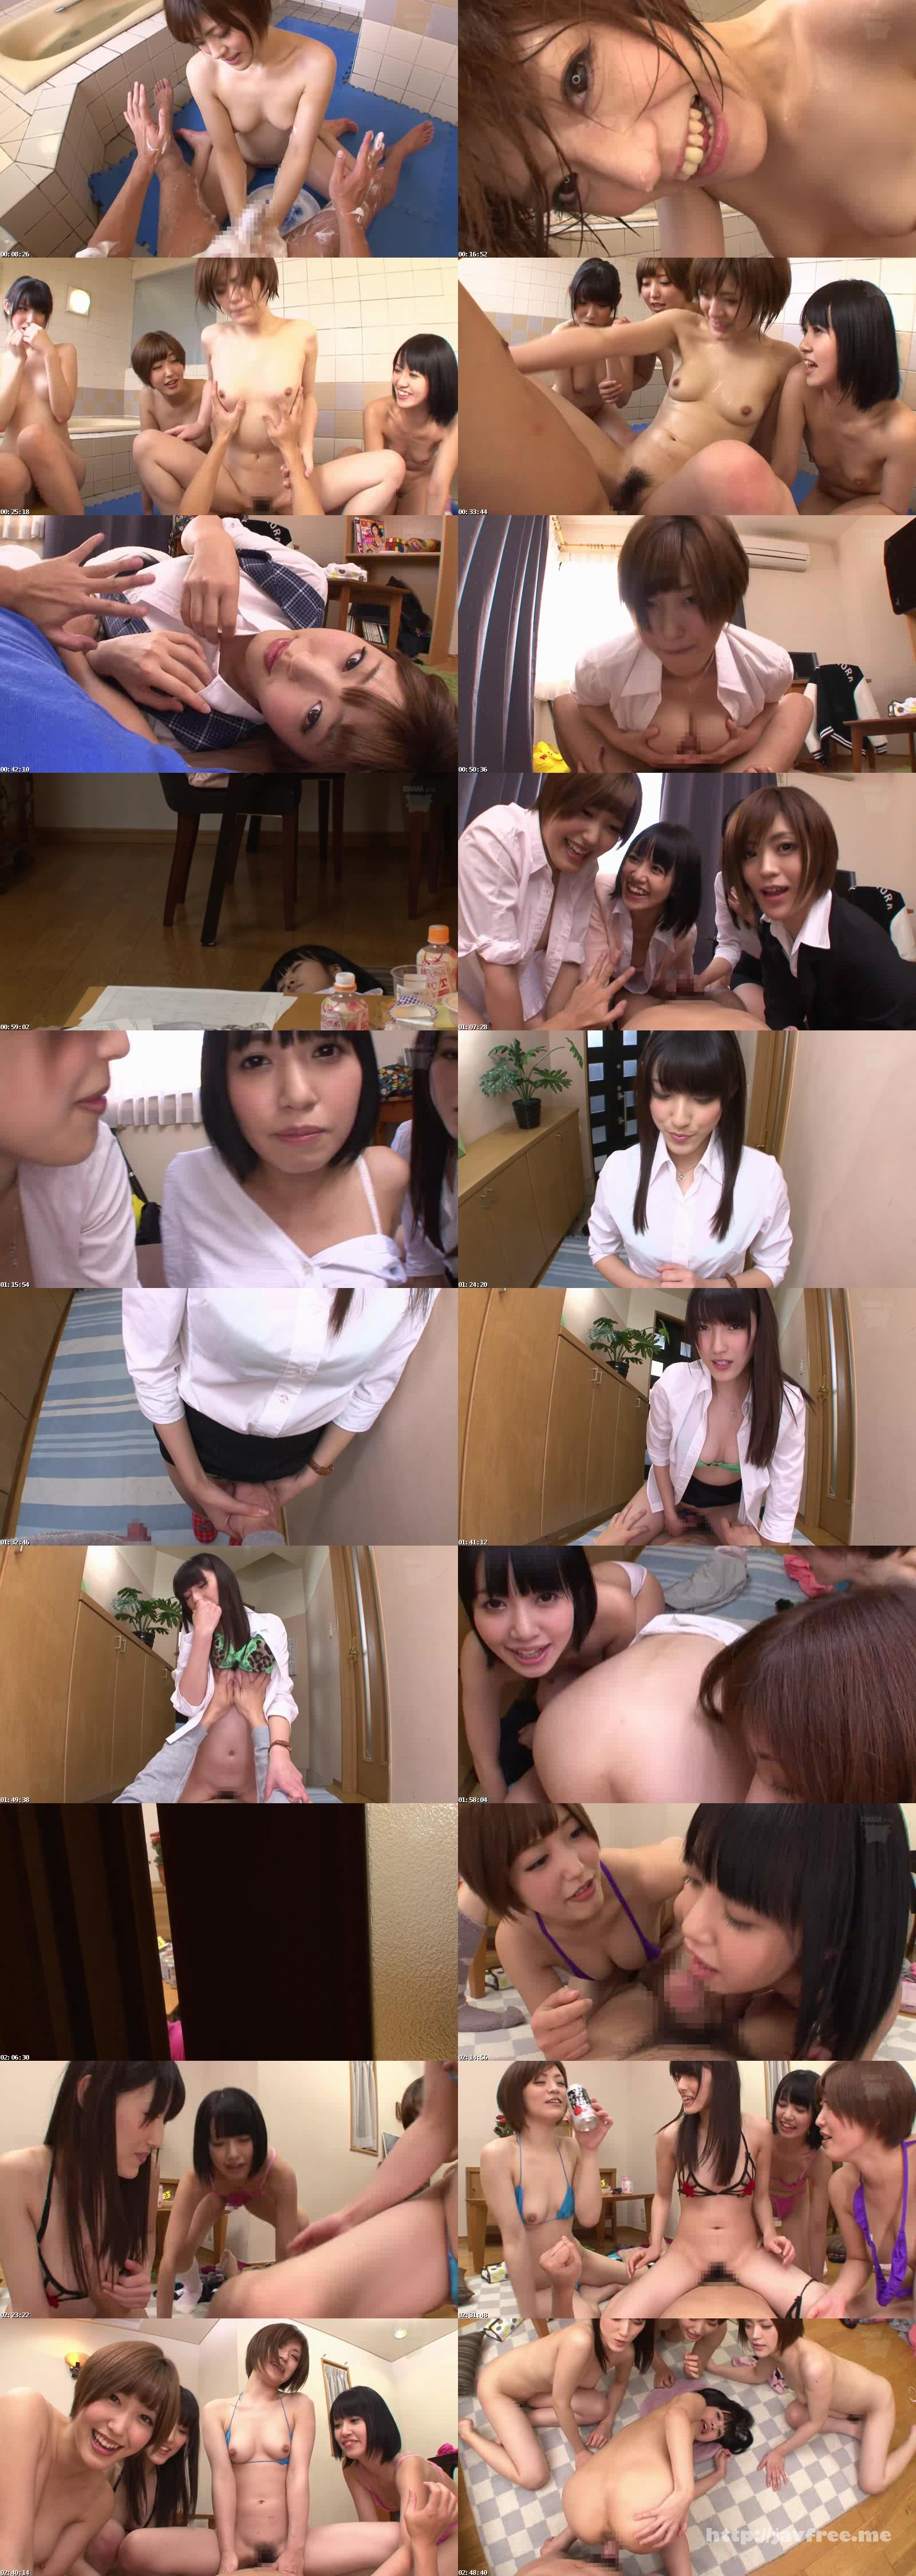 [ZUKO 076] 姉とその同僚がエロすぎたから子作り 飯岡かなこ 水野朝陽 板垣あずさ 朝倉こと み ZUKO